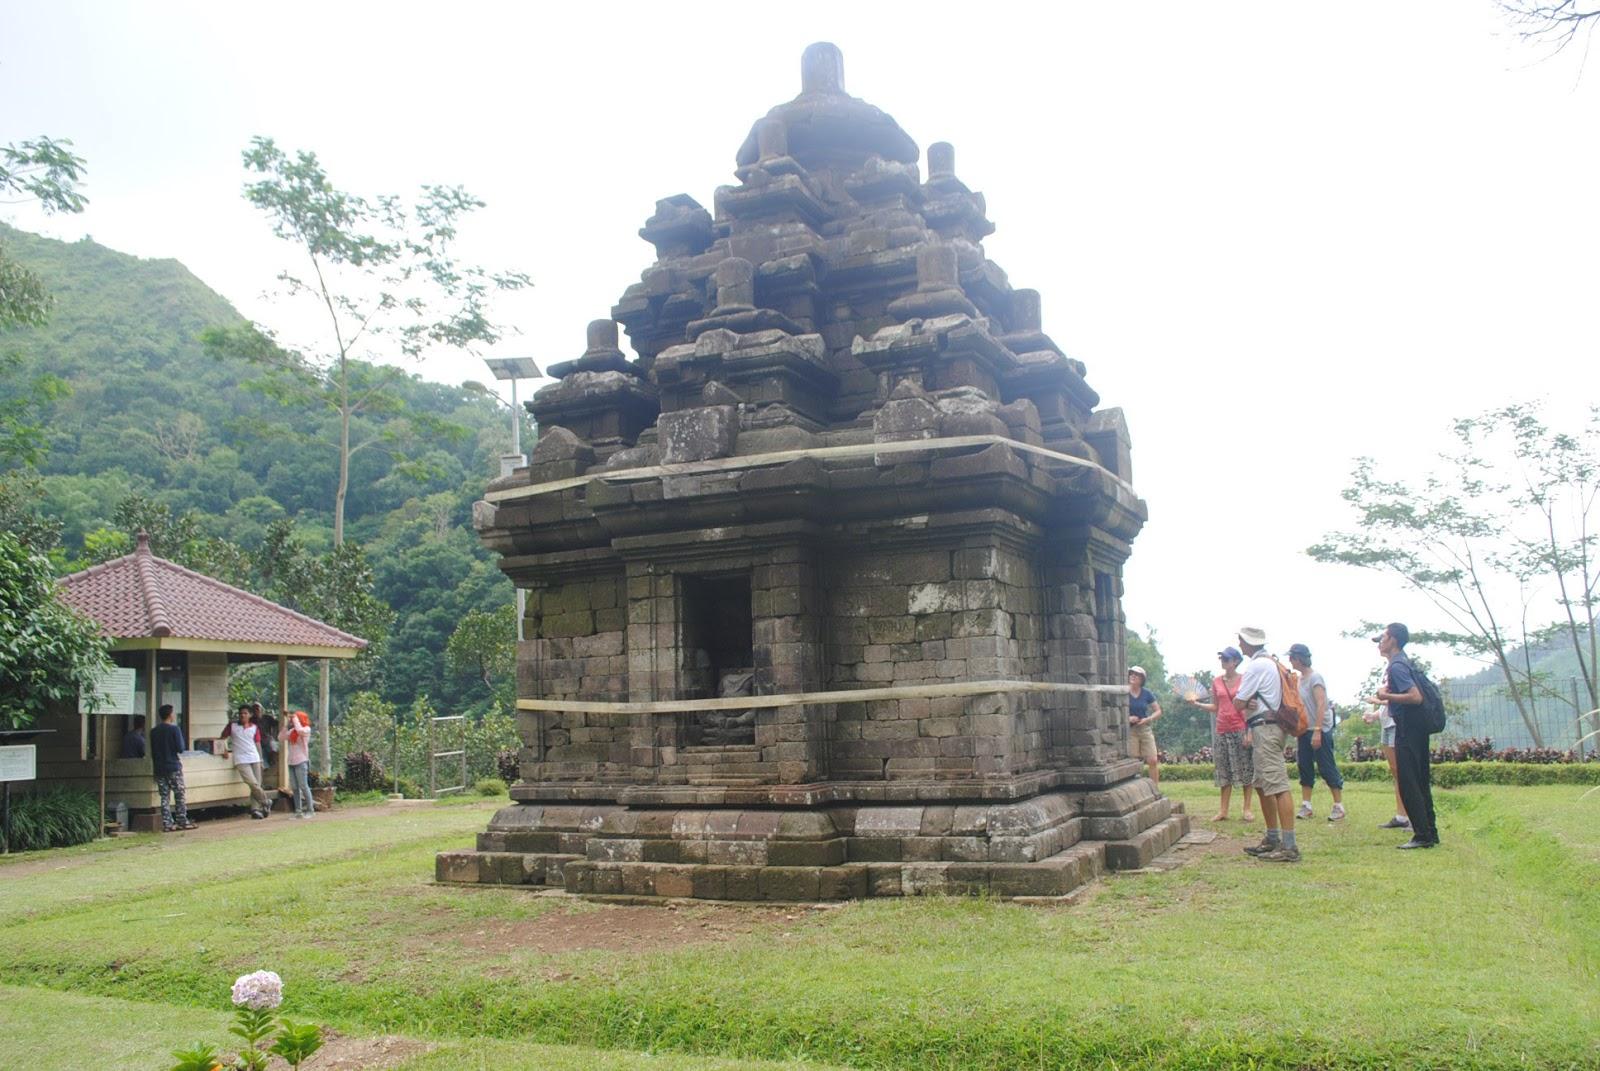 Candi Selogriyo Ubudnya Borobudur Info Wisata Magelang Infoborobudur Satu Menarik